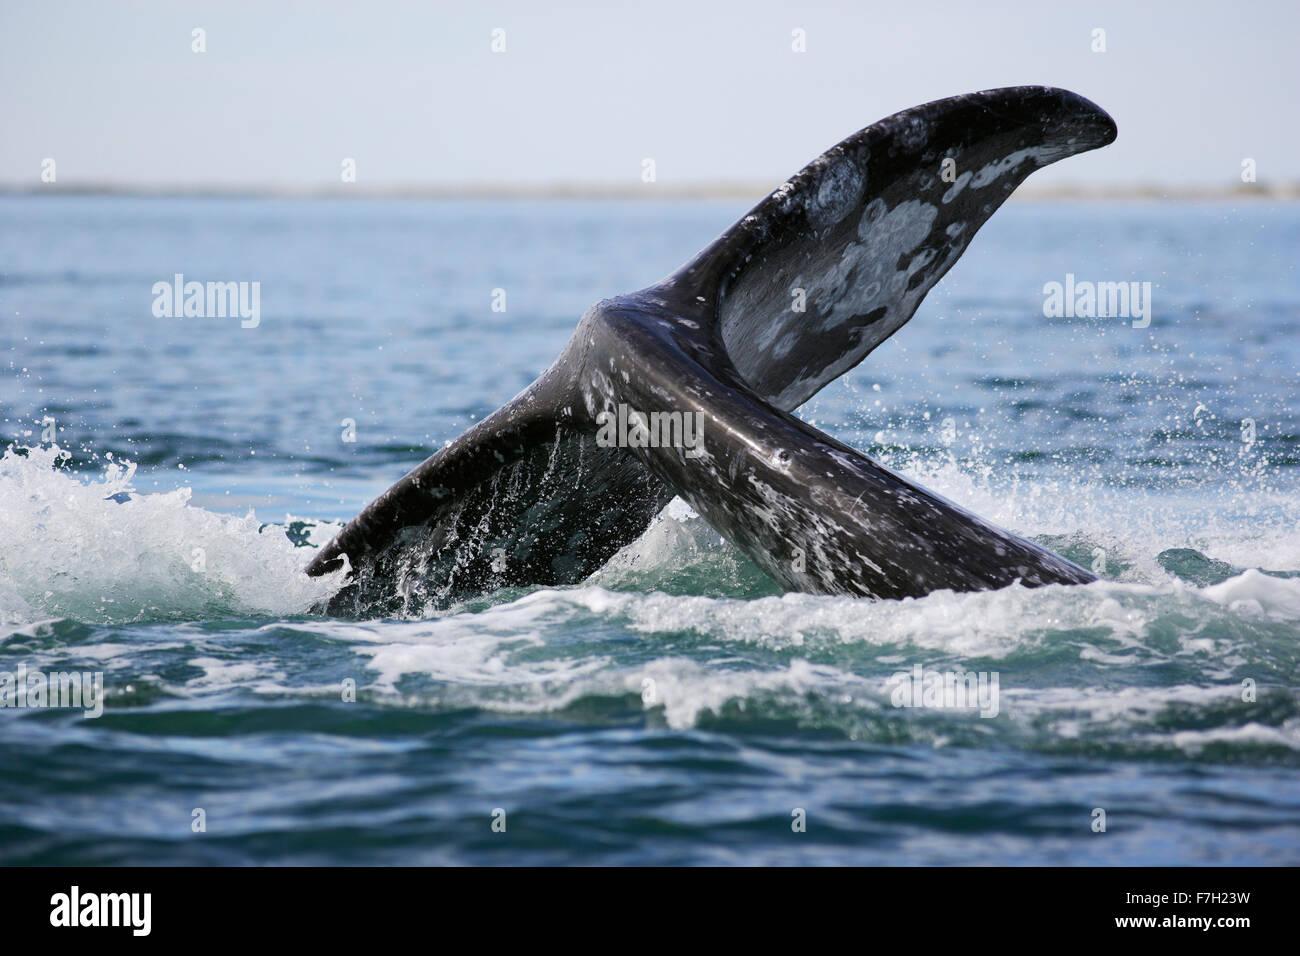 pr0176-D. Gray Whale (Eschrichtius robustus) lob-tailing. San Ignacio Lagoon, Baja, Mexico. Photo Copyright © - Stock Image